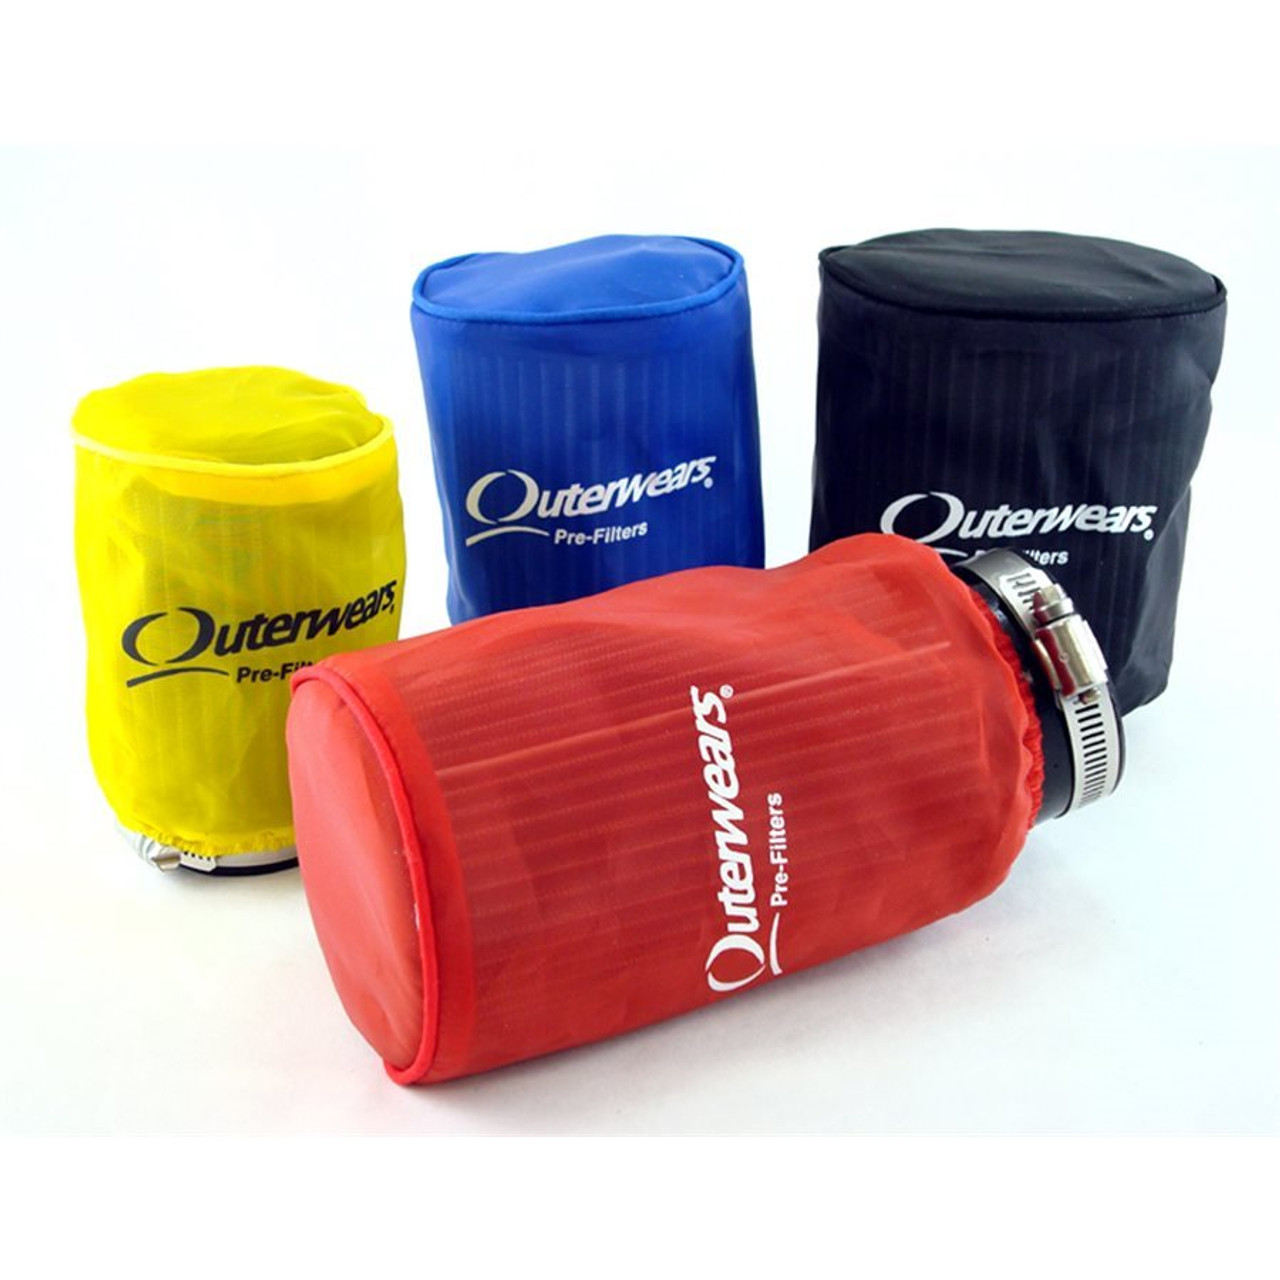 "Outerwears Prefilter, 3-1/2"" x 4"" (Yellow)"